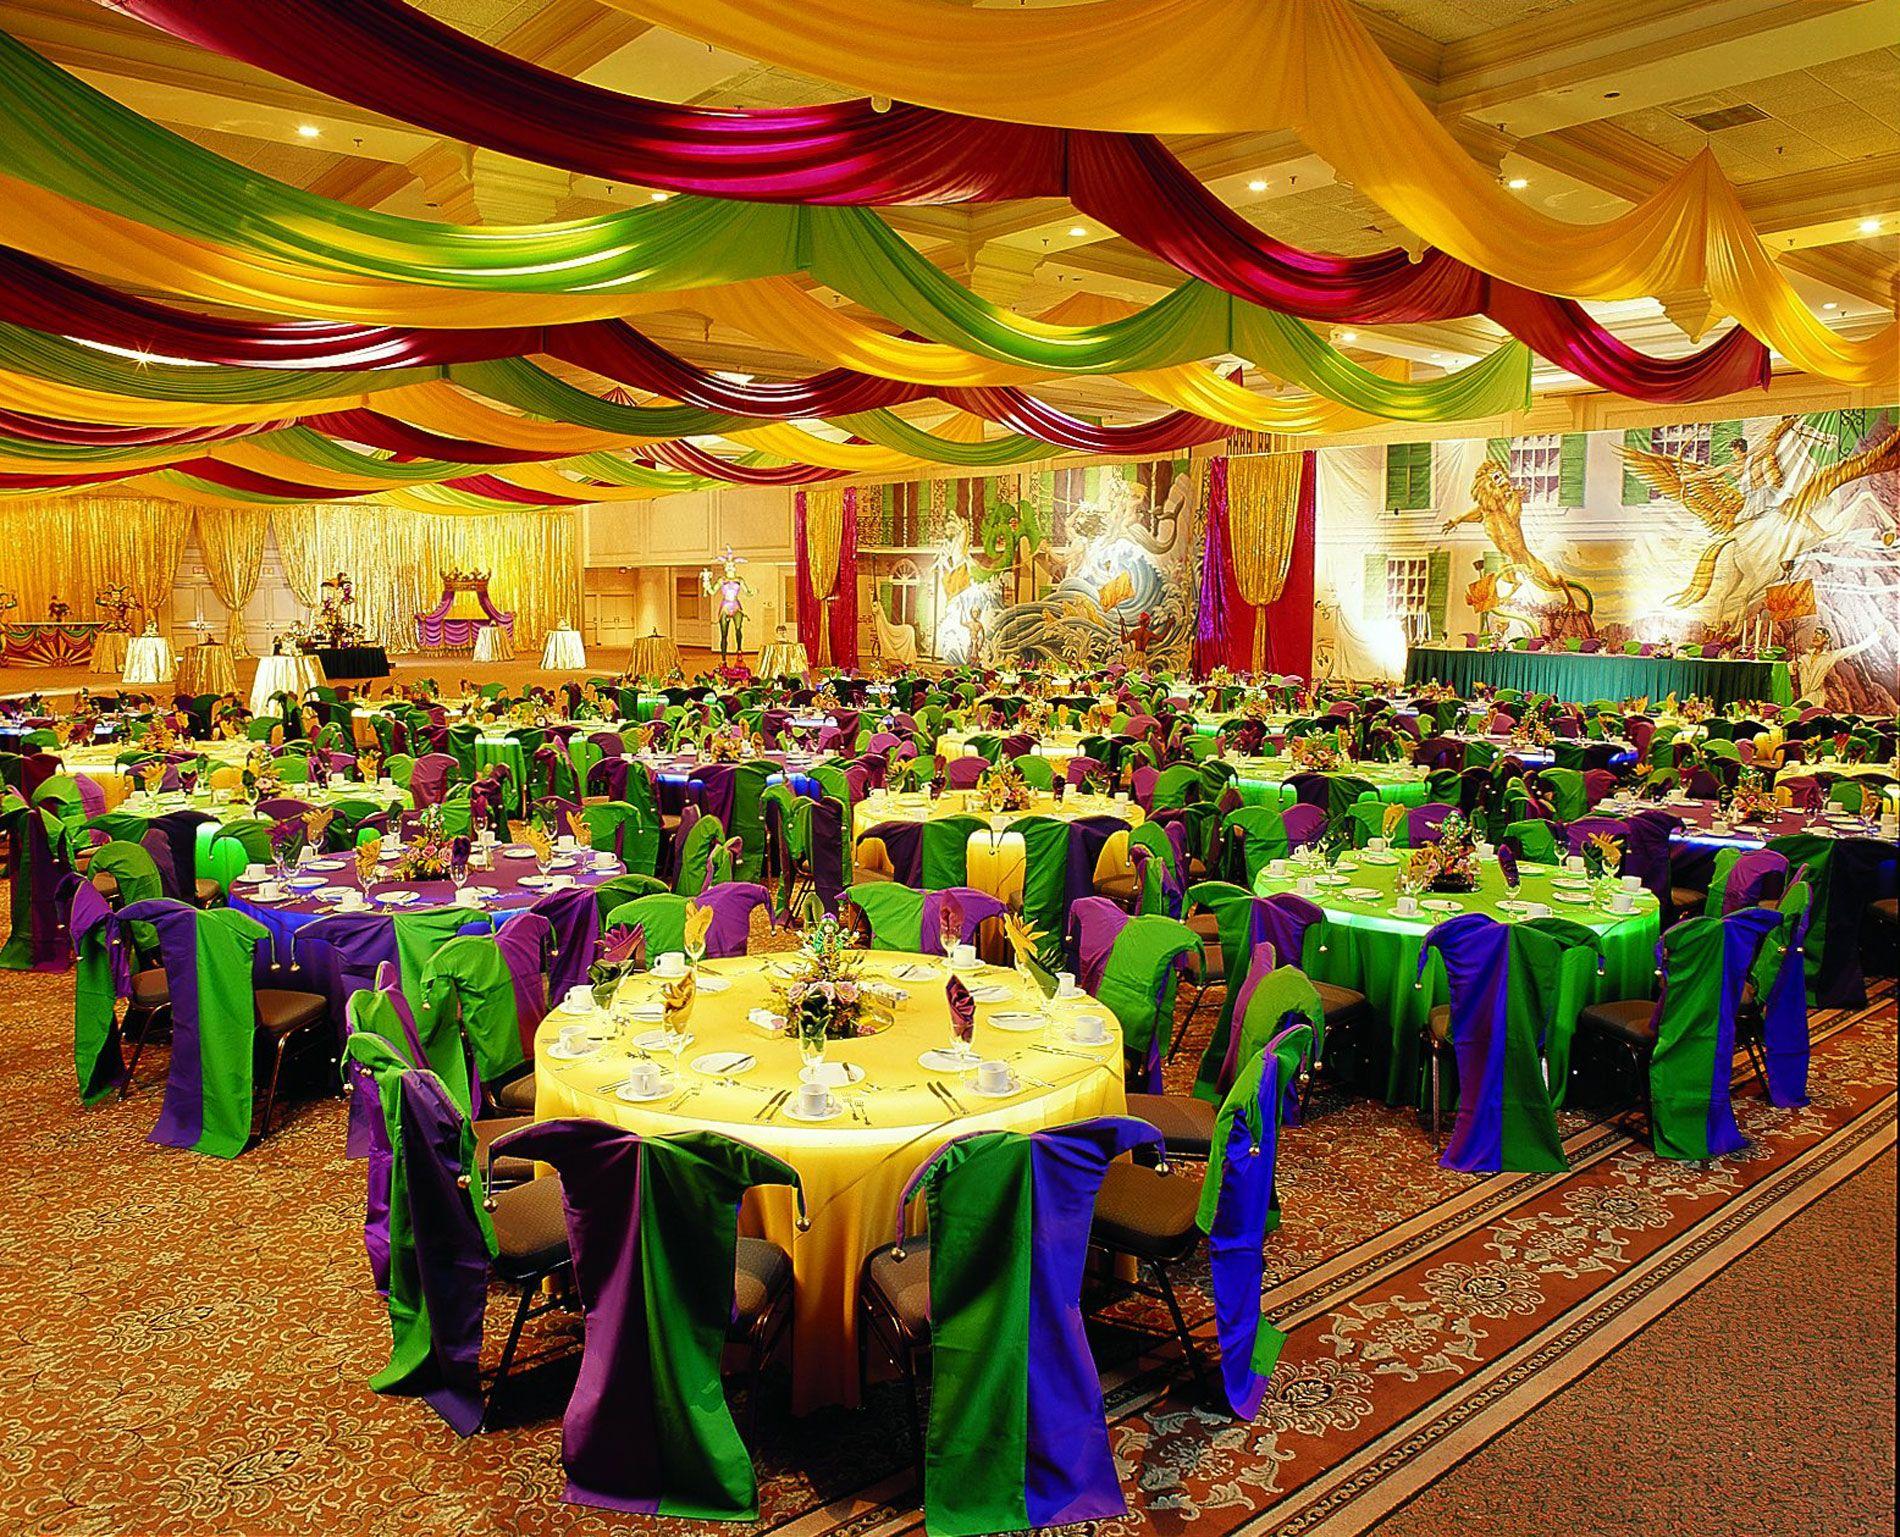 Mardi Gras Table Decoration Ideas - Elitflat